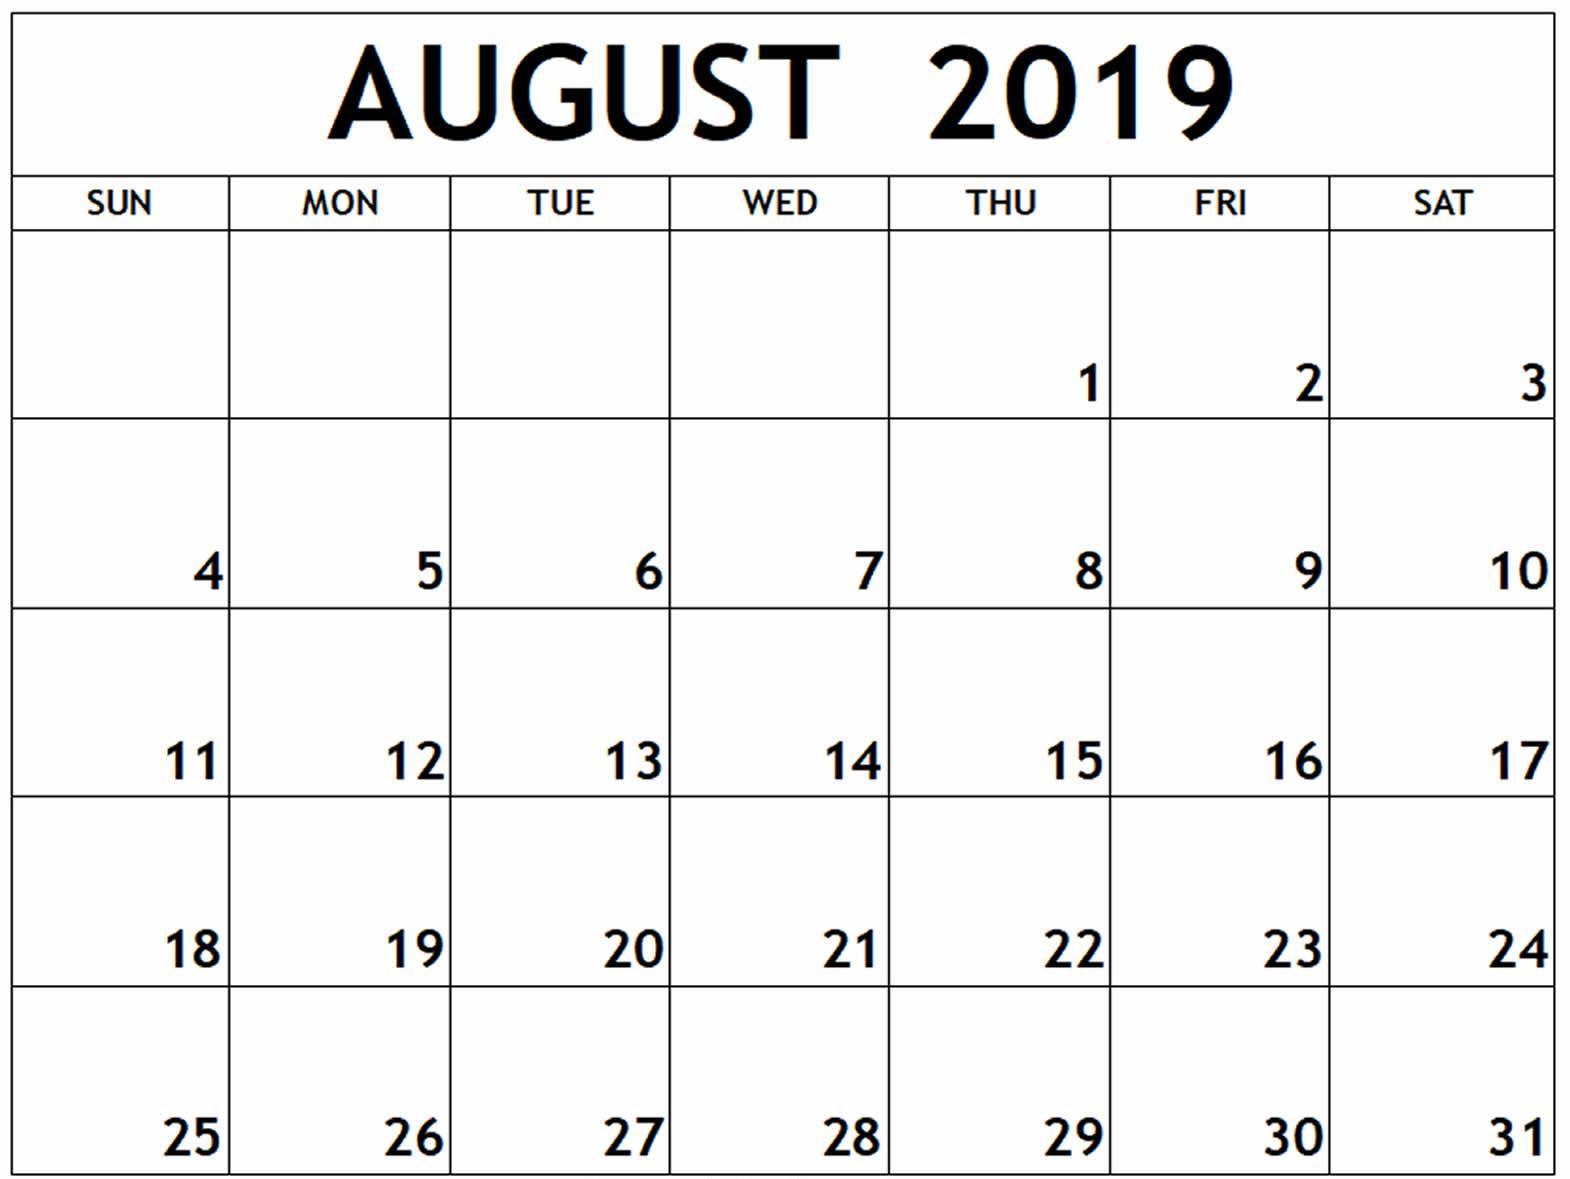 August 2019 Calendar Printable - Free August 2019 Calendar Printable intended for August Calendar Template With Notes